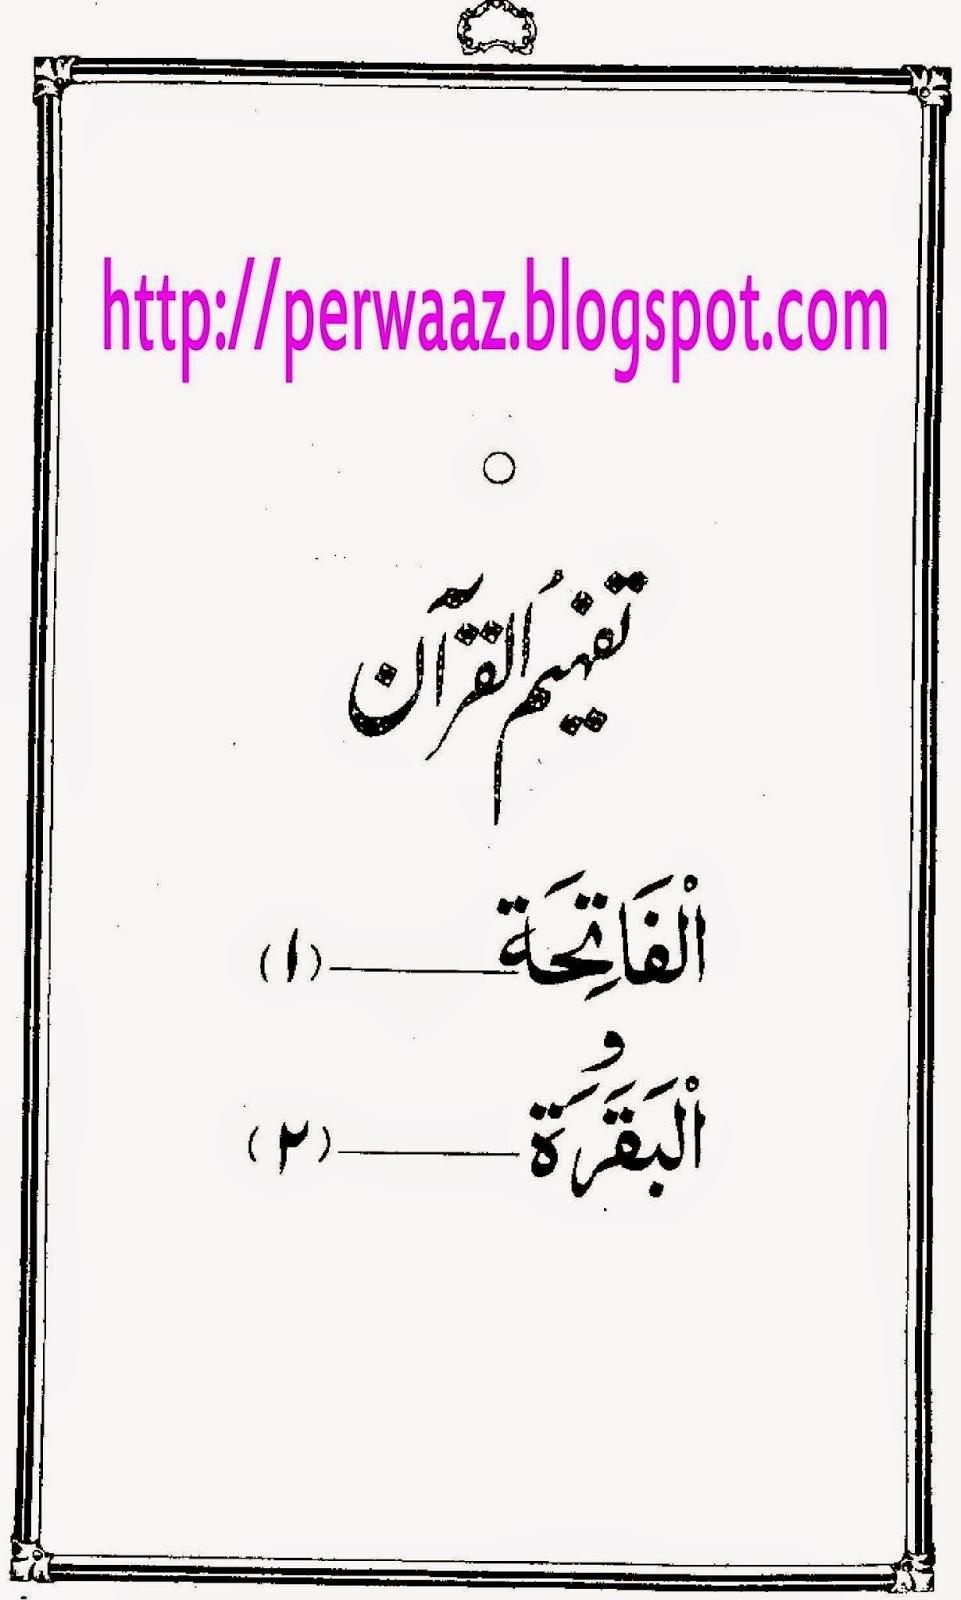 Workbooks urdu tafheem worksheets : Tafheem Ul Quran Pdf English / The Eye: Infinity